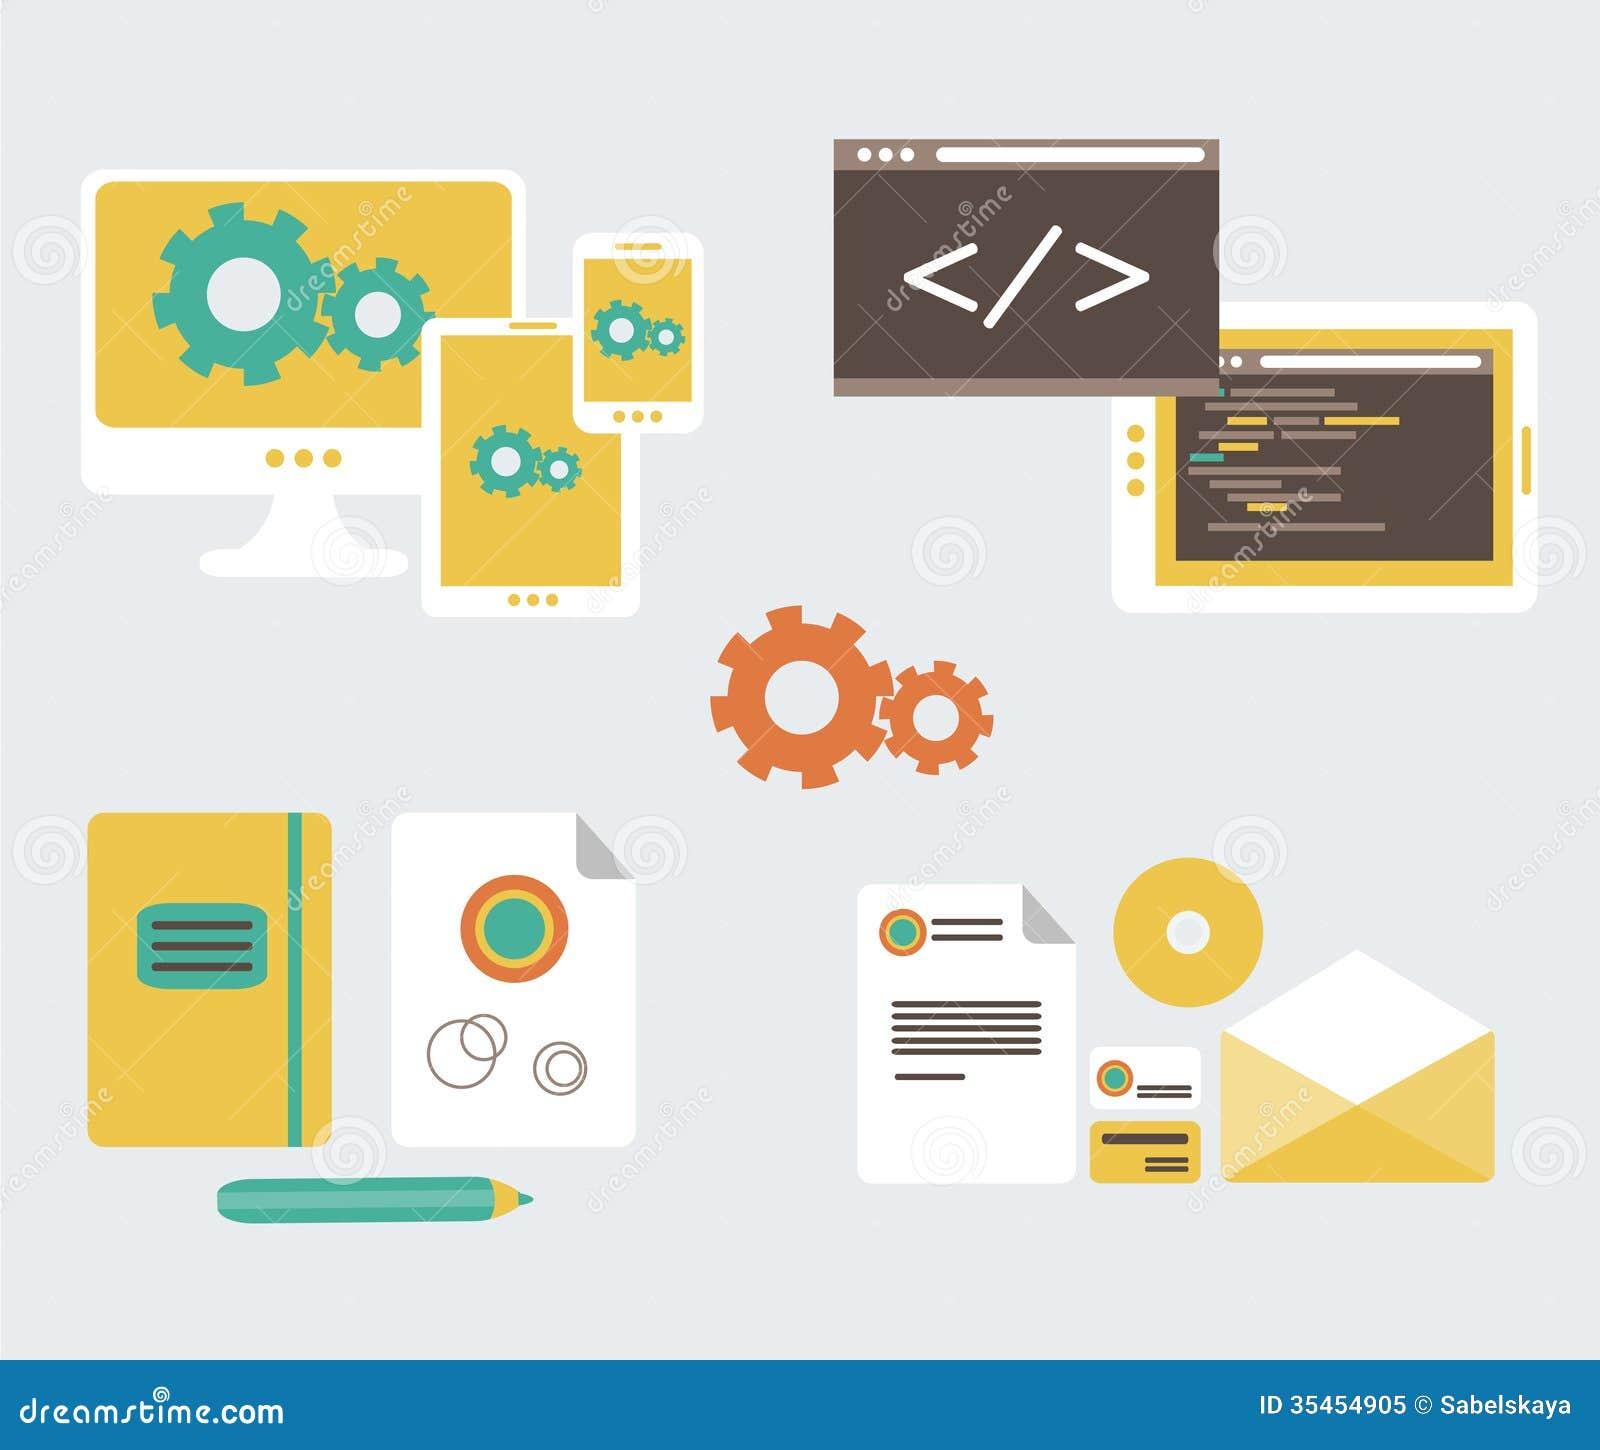 Vector Illustration Web Designs: Flat Design Of Business Branding And Development W Royalty